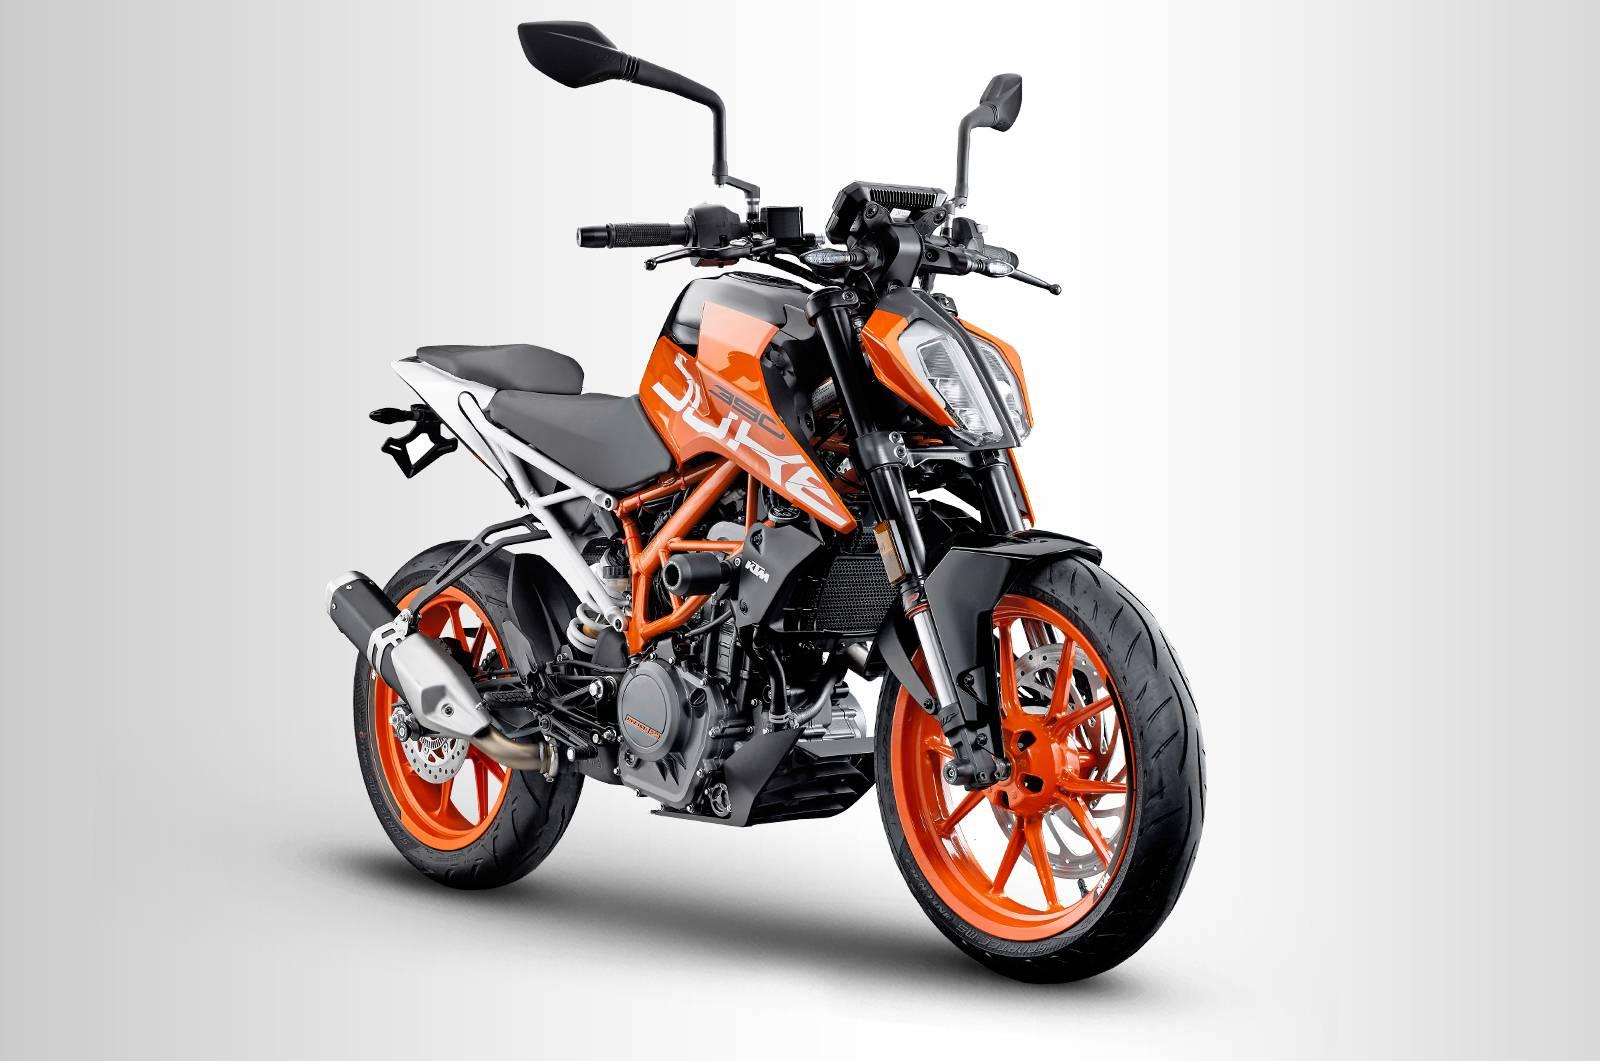 Ktm Duke 390 2017 Price >> Motortrade